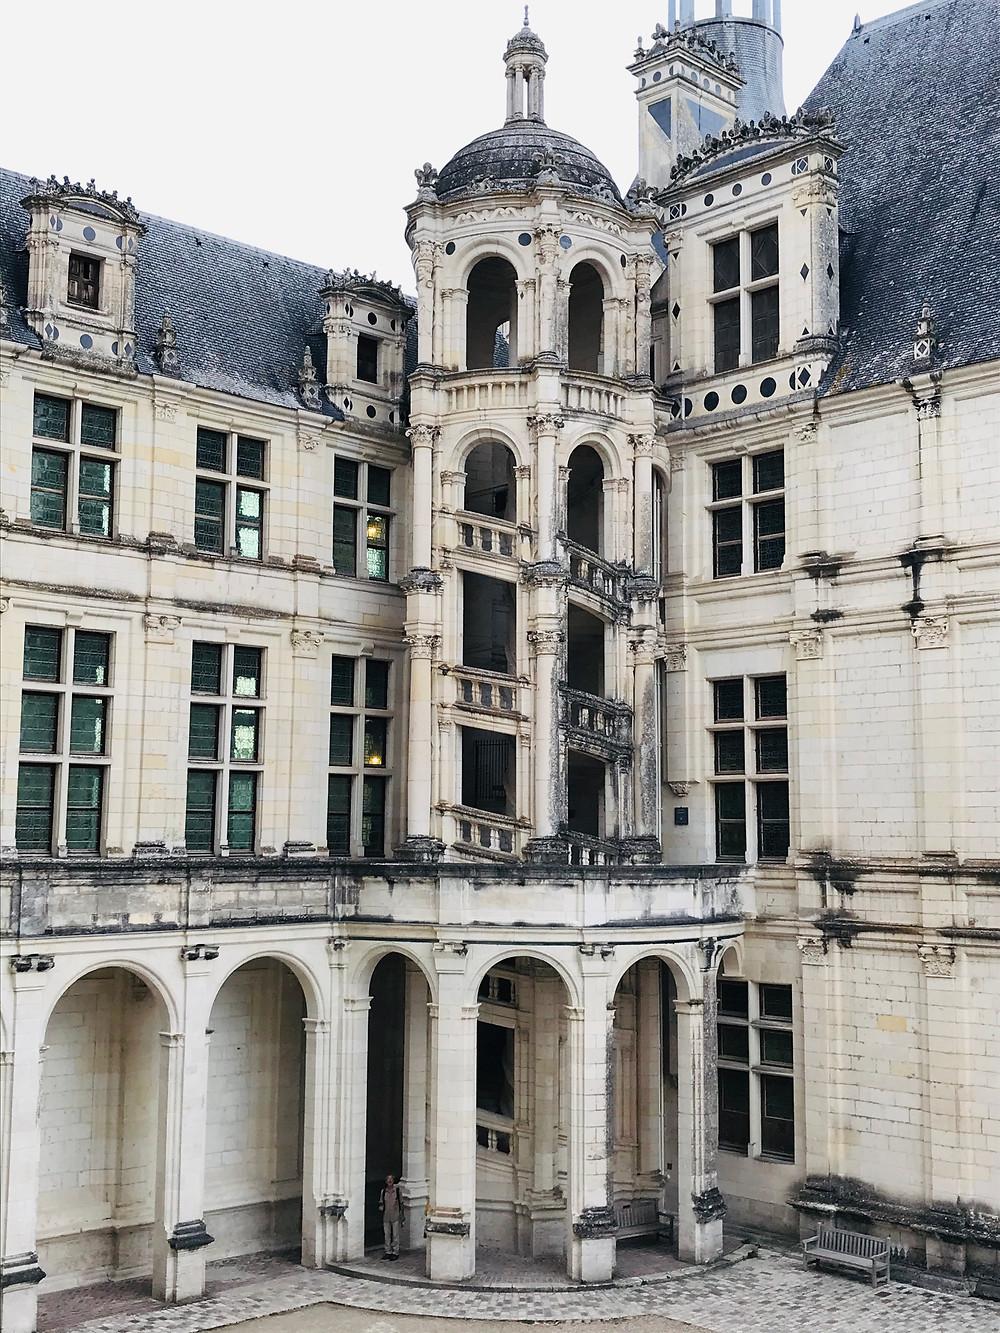 chateau-de-chambord-inner-courtyard